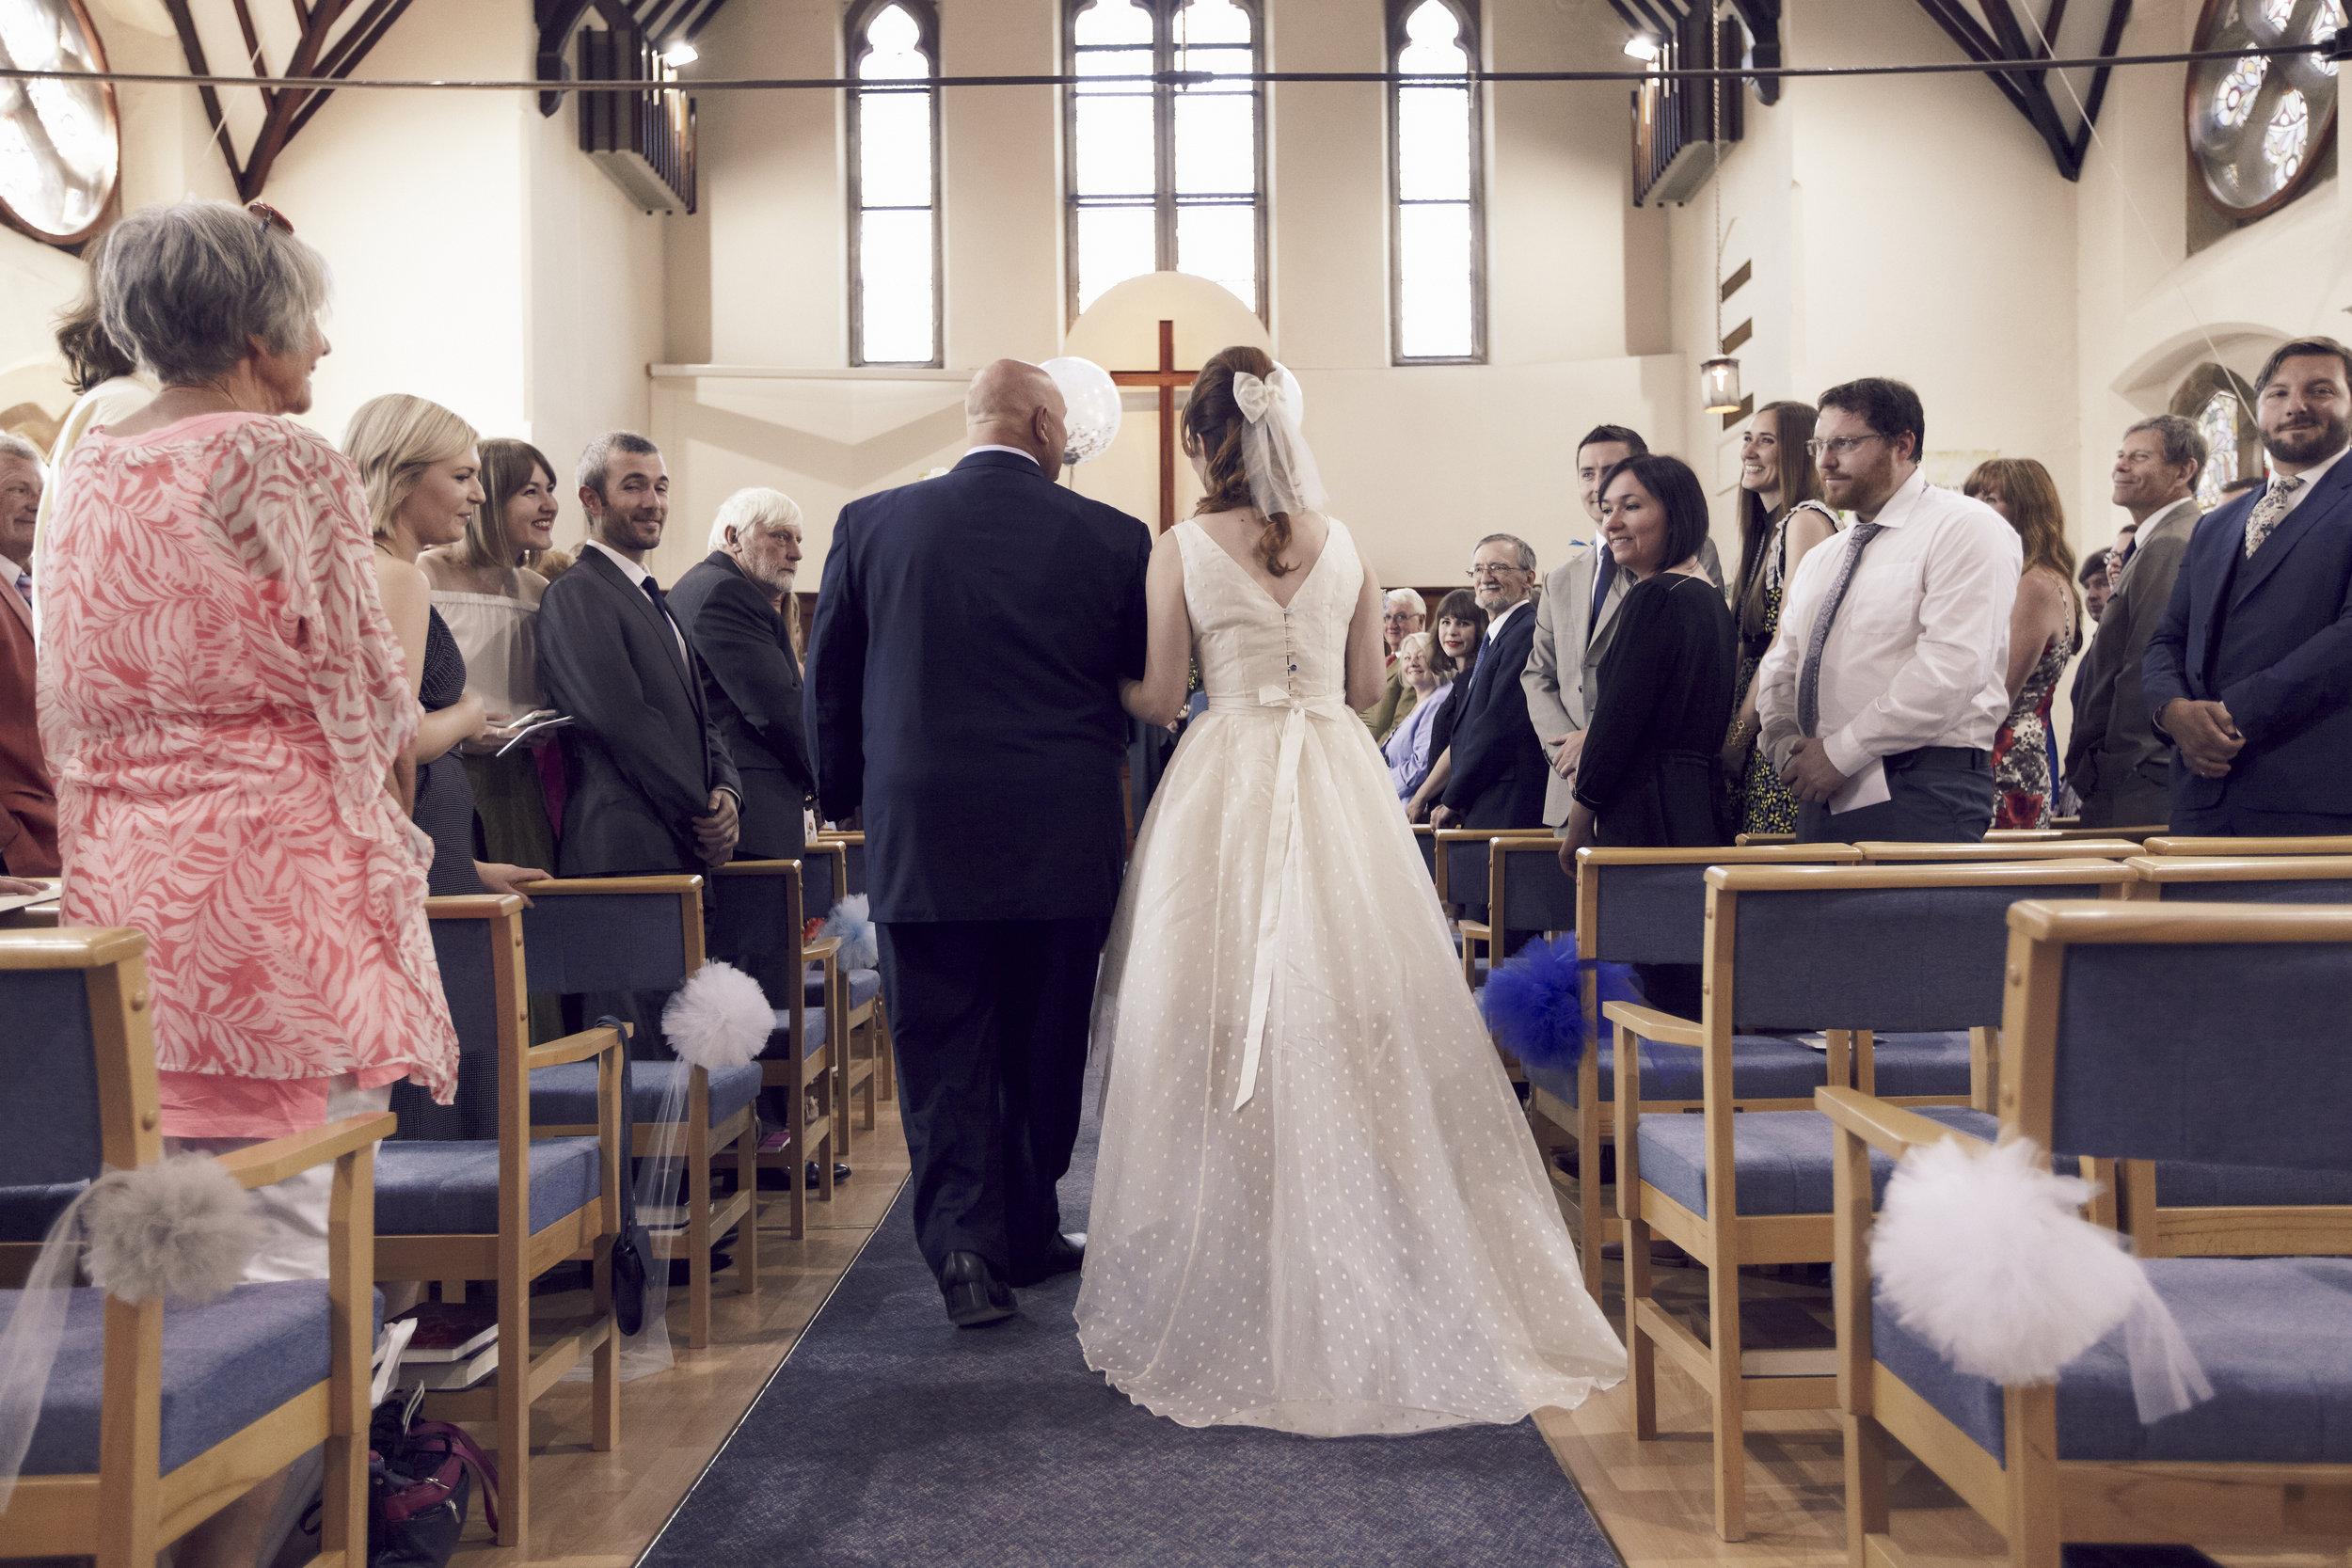 Suzi-Matlock-Polka-Dot-Bespoke-Wedding-Dress-High-Low-Susanna-Greening-Designs-Derbyshire-9